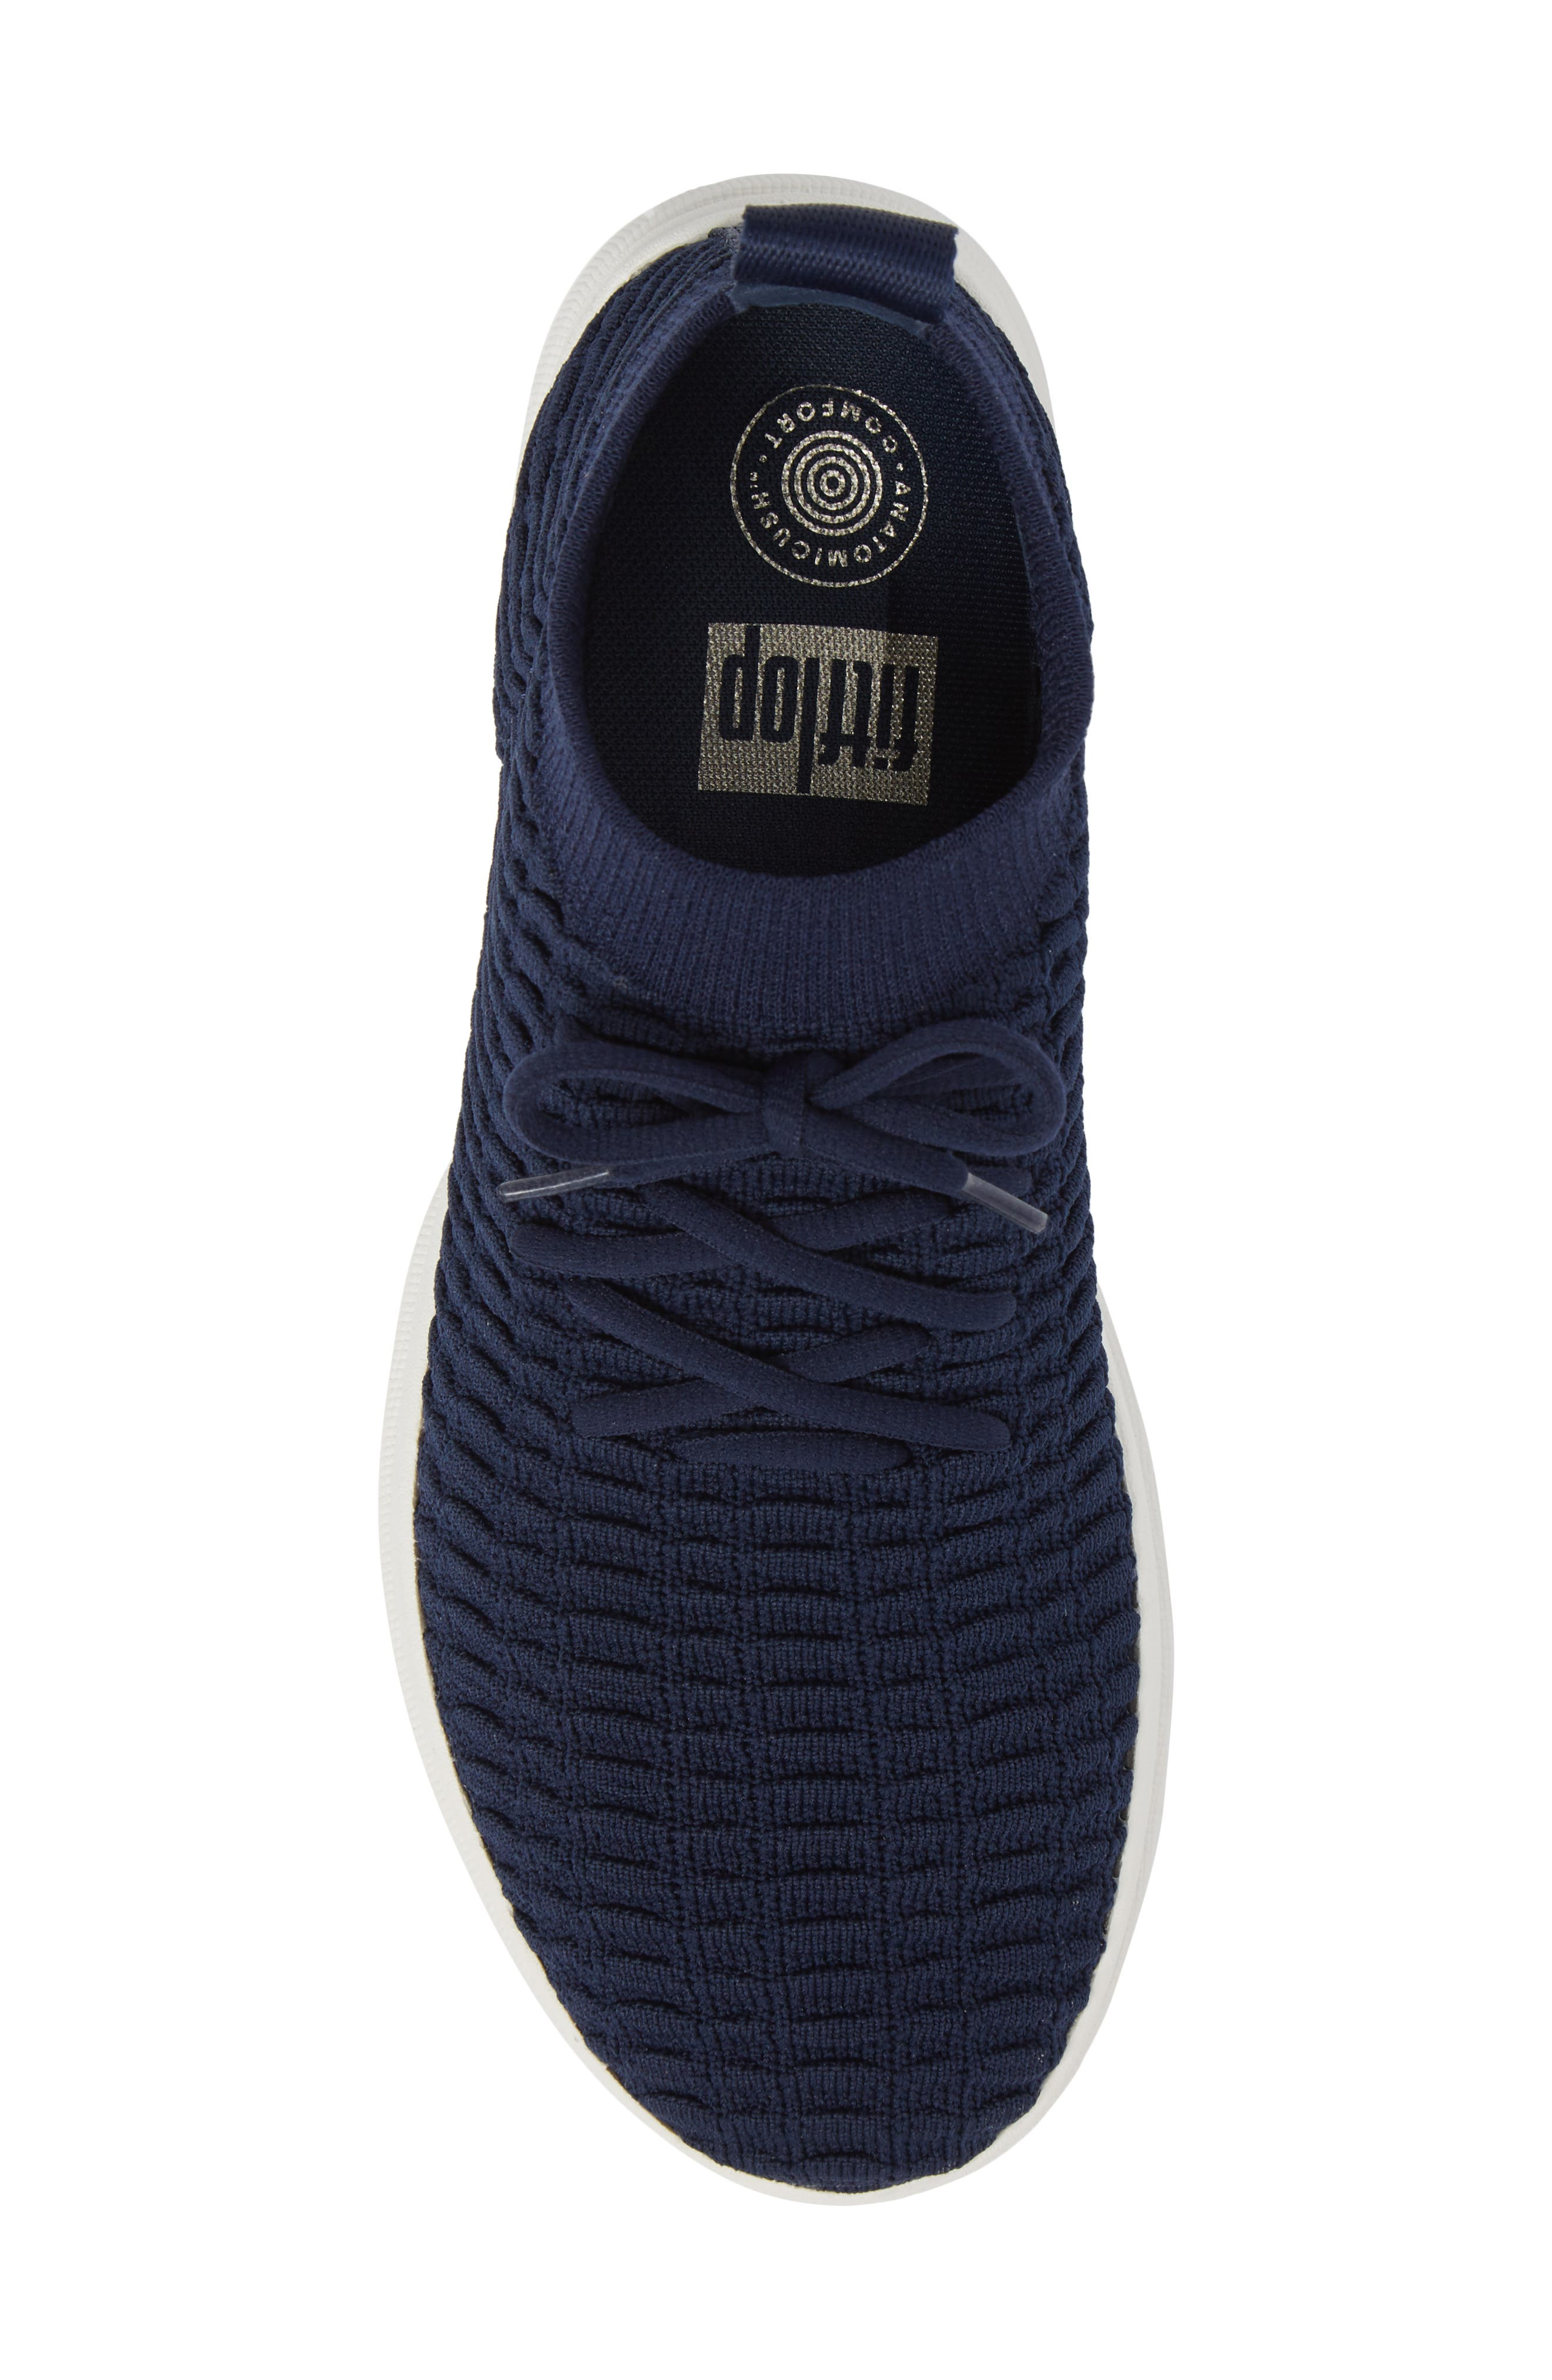 Uberknit<sup>™</sup> Slip-On High Top Sneaker,                             Alternate thumbnail 4, color,                             Midnight Navy